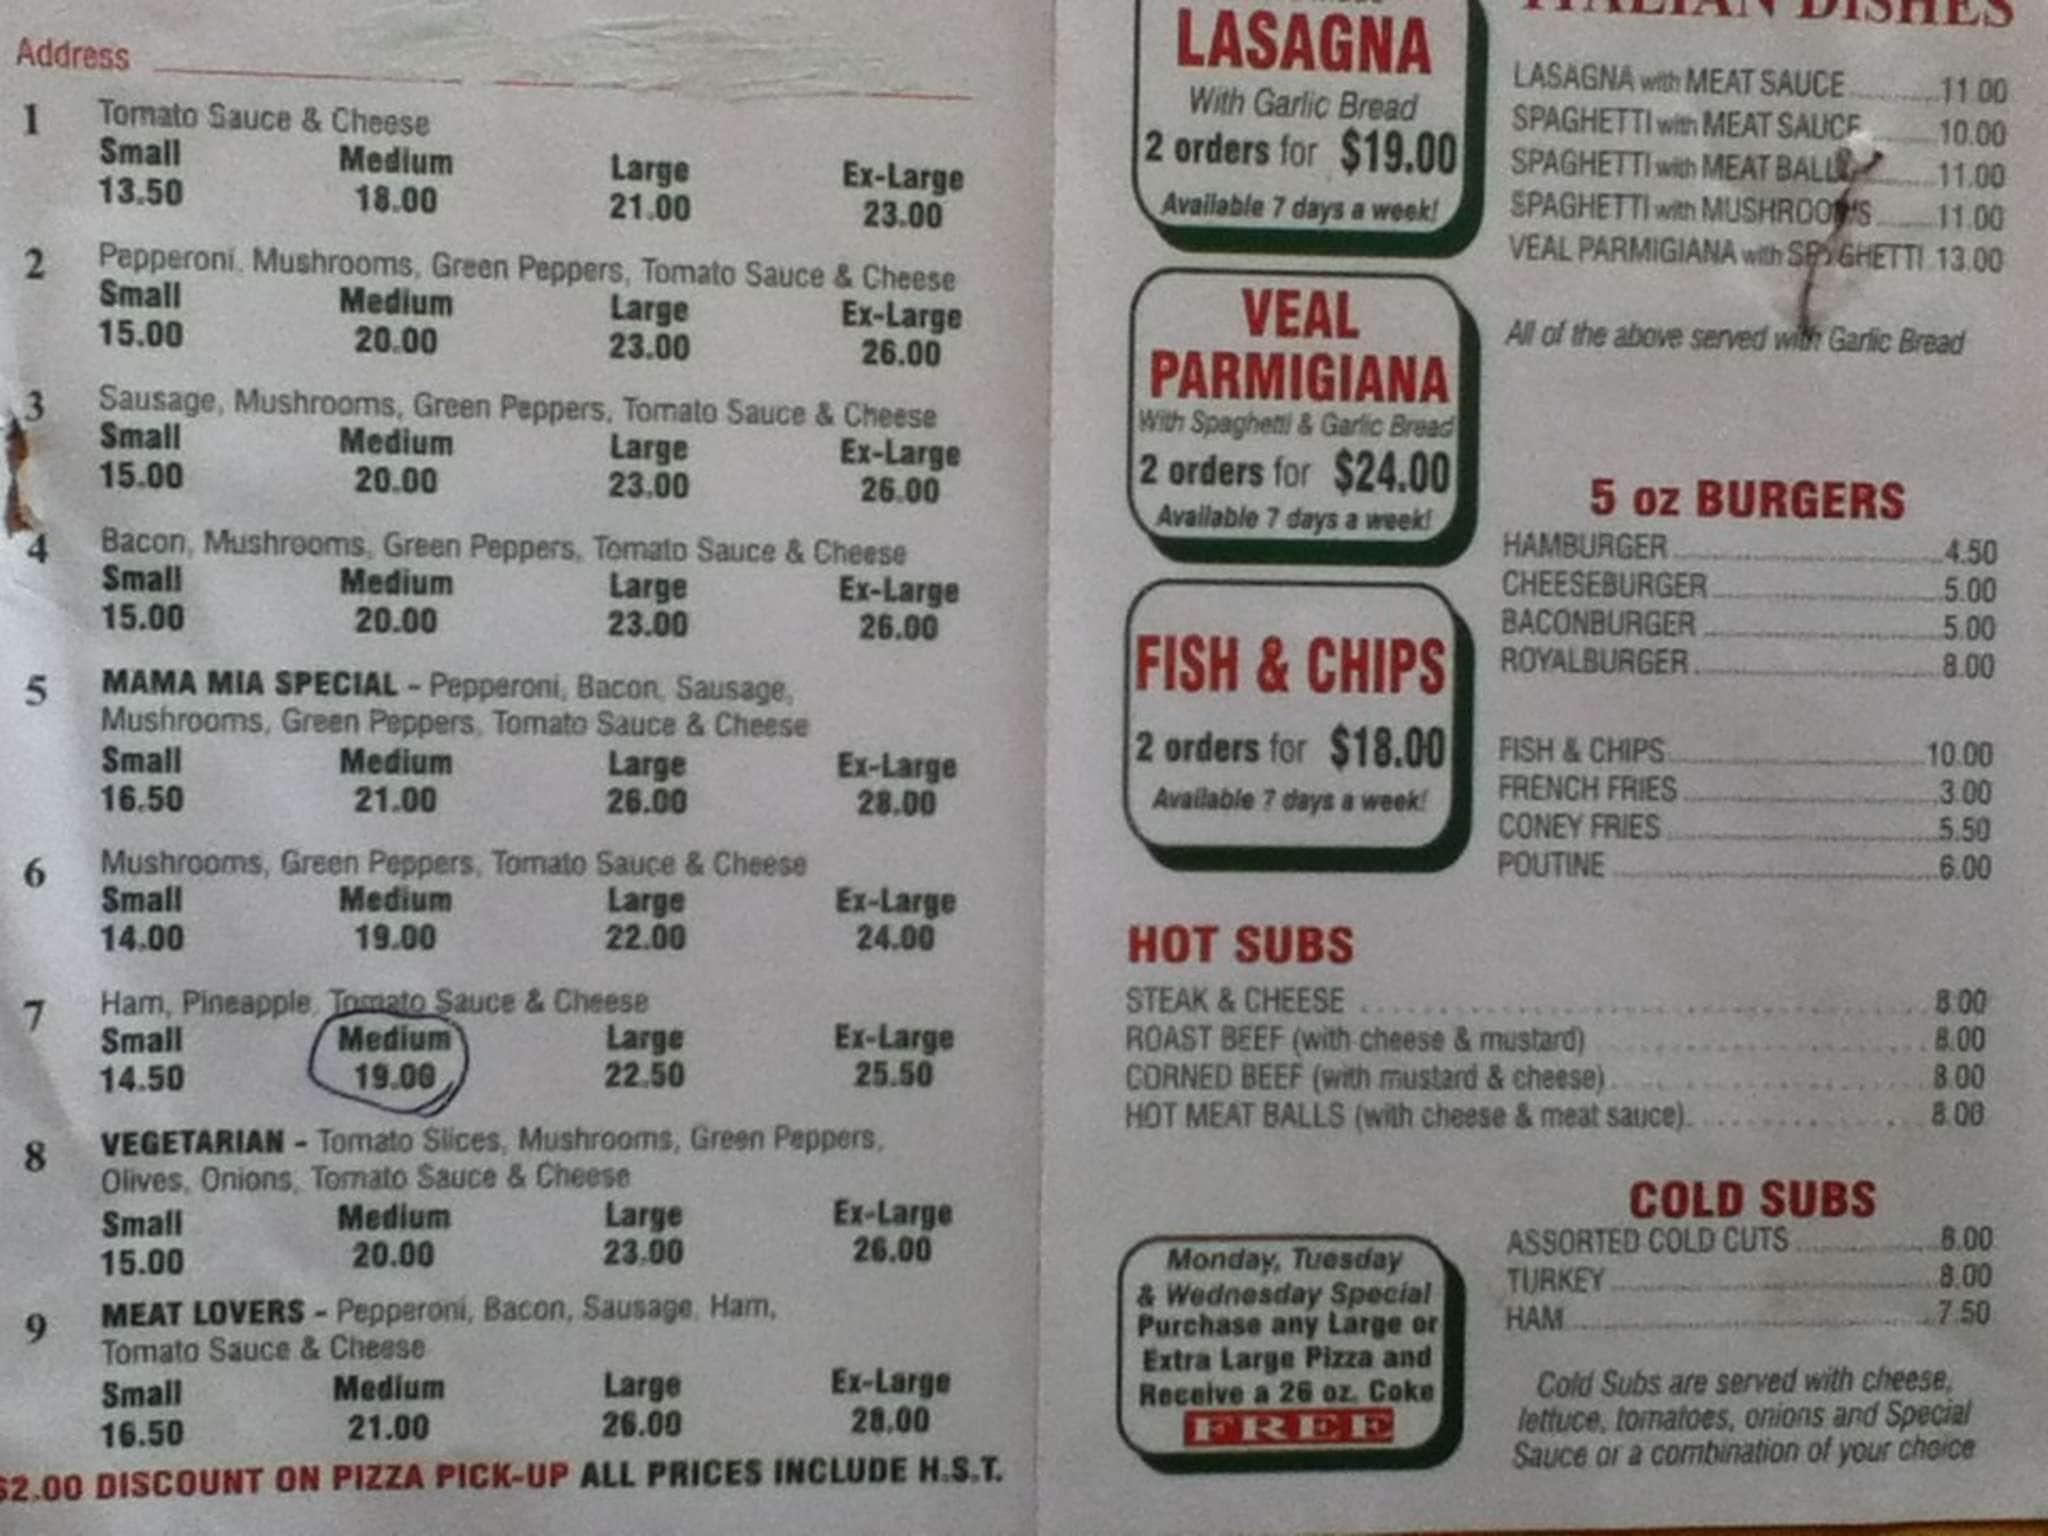 Mama mia pizzeria coupons